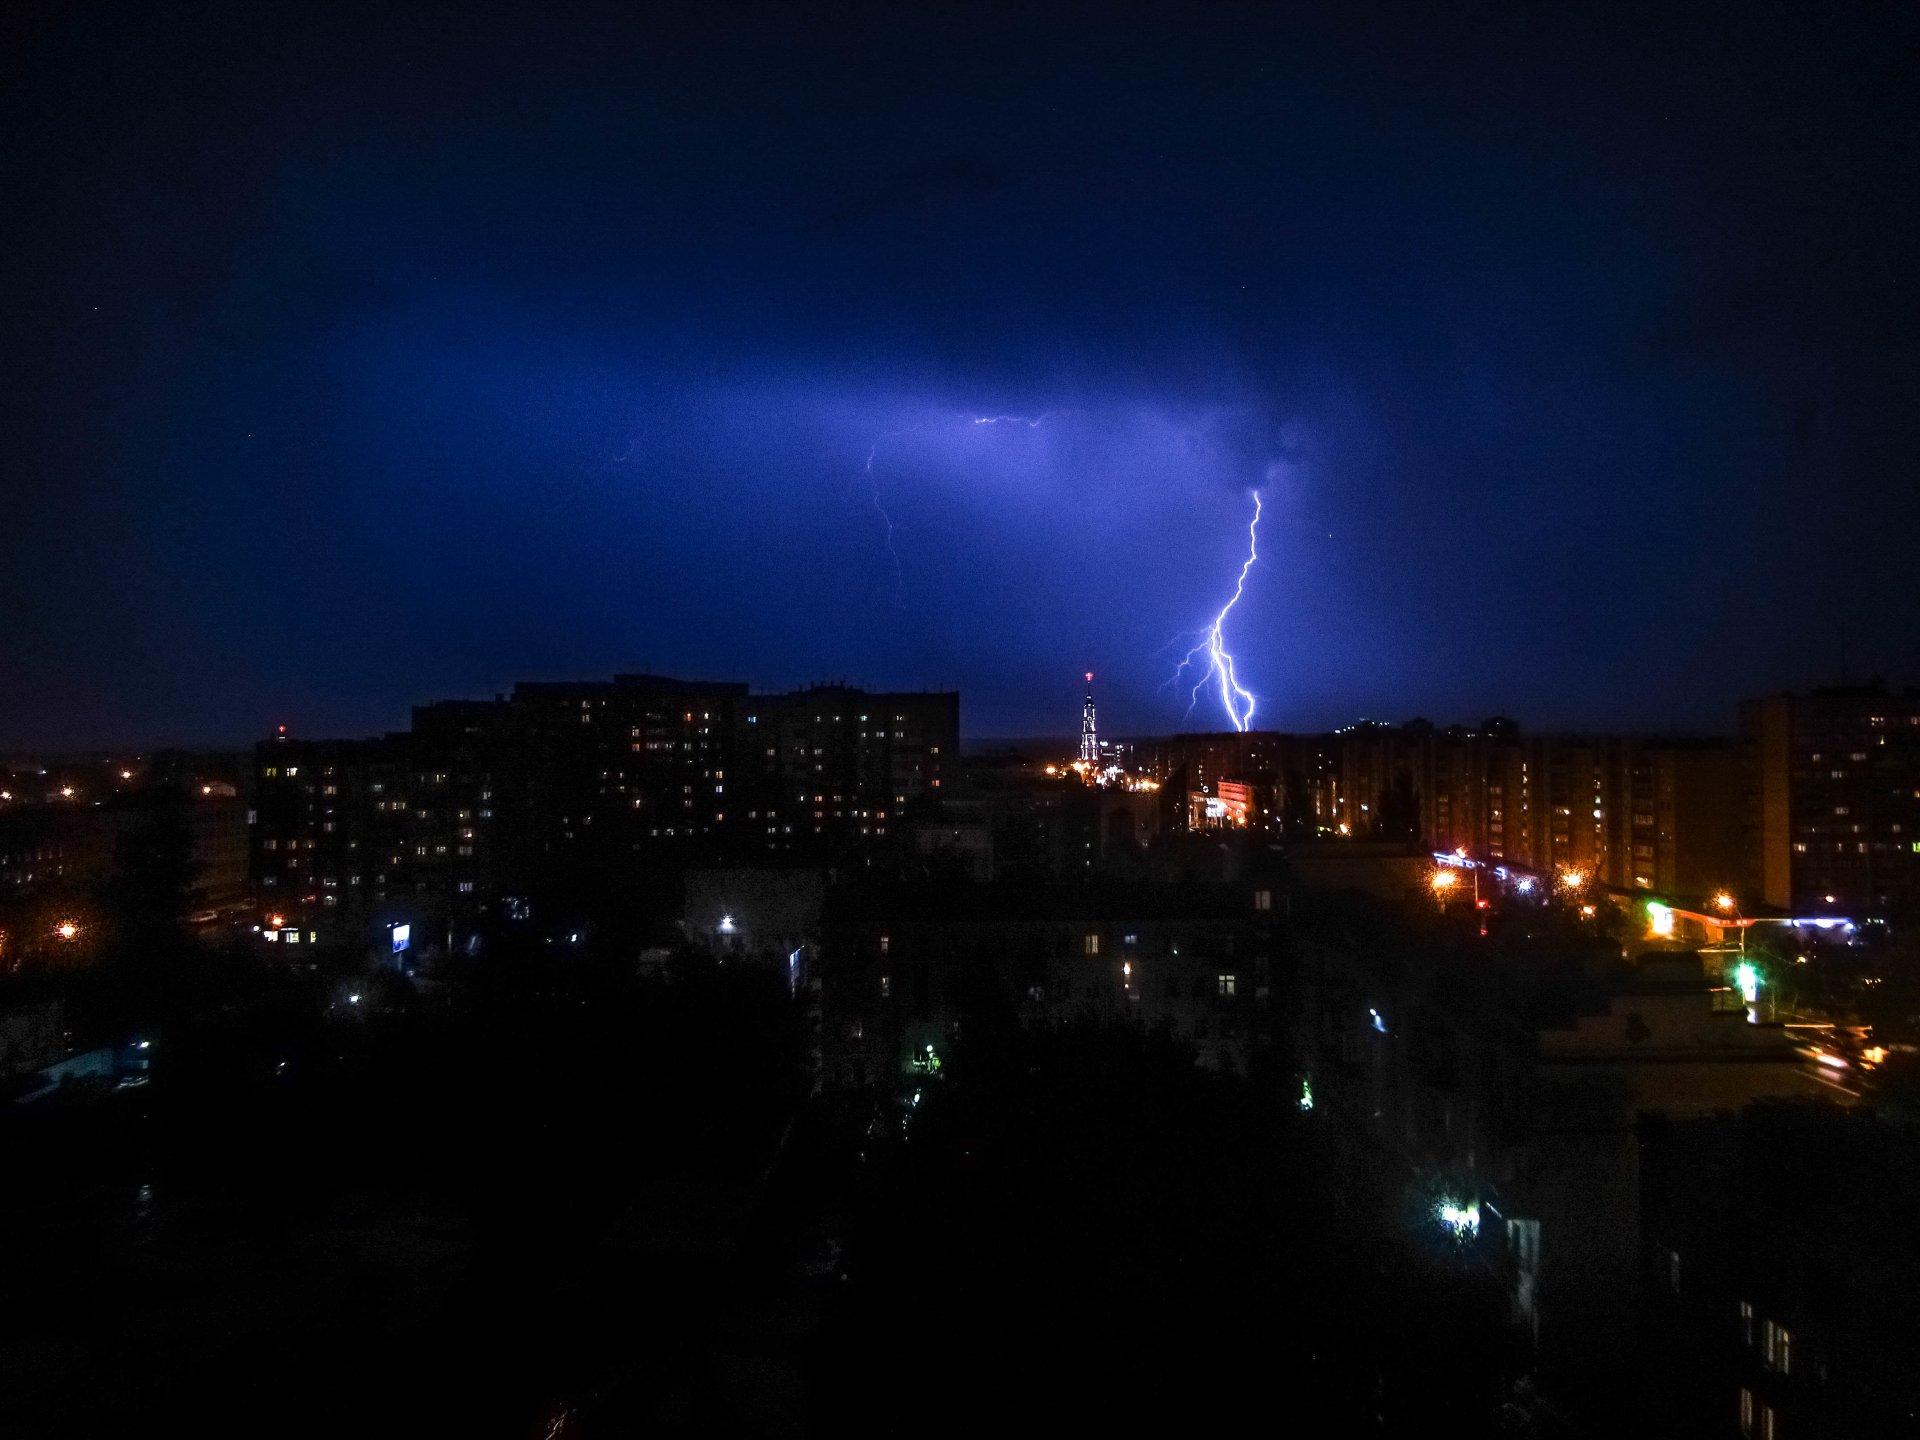 lightning 4k ultra hd wallpaper  background image